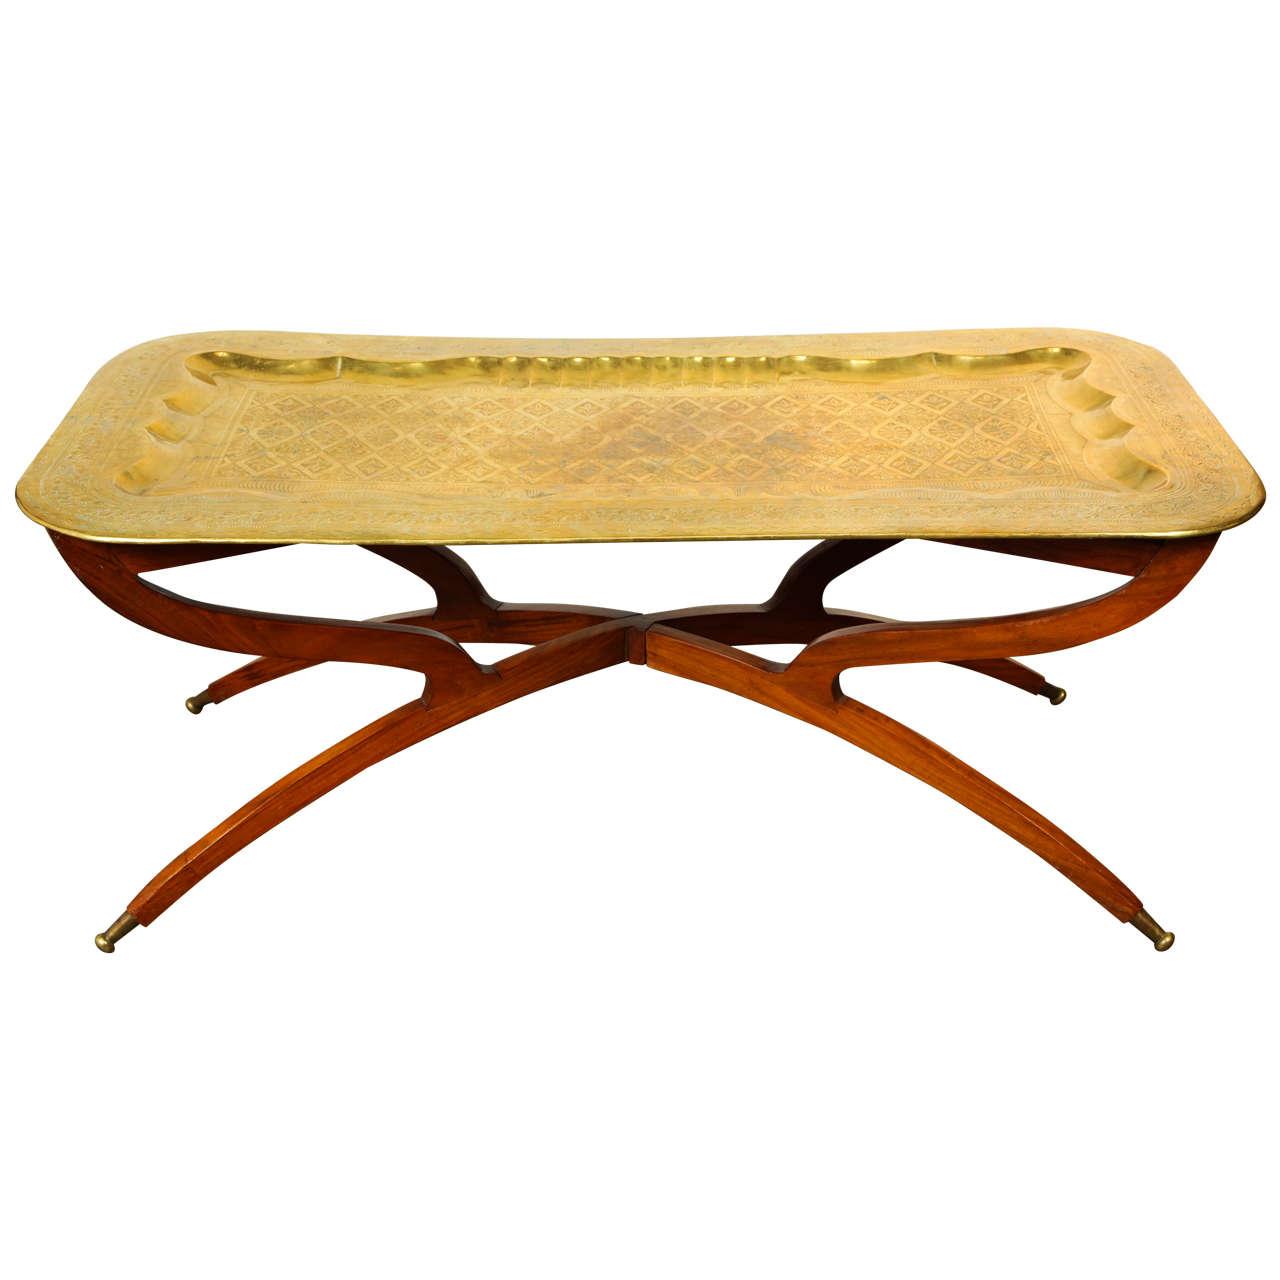 Moroccan Rectangular Brass Tray Coffee Table 1